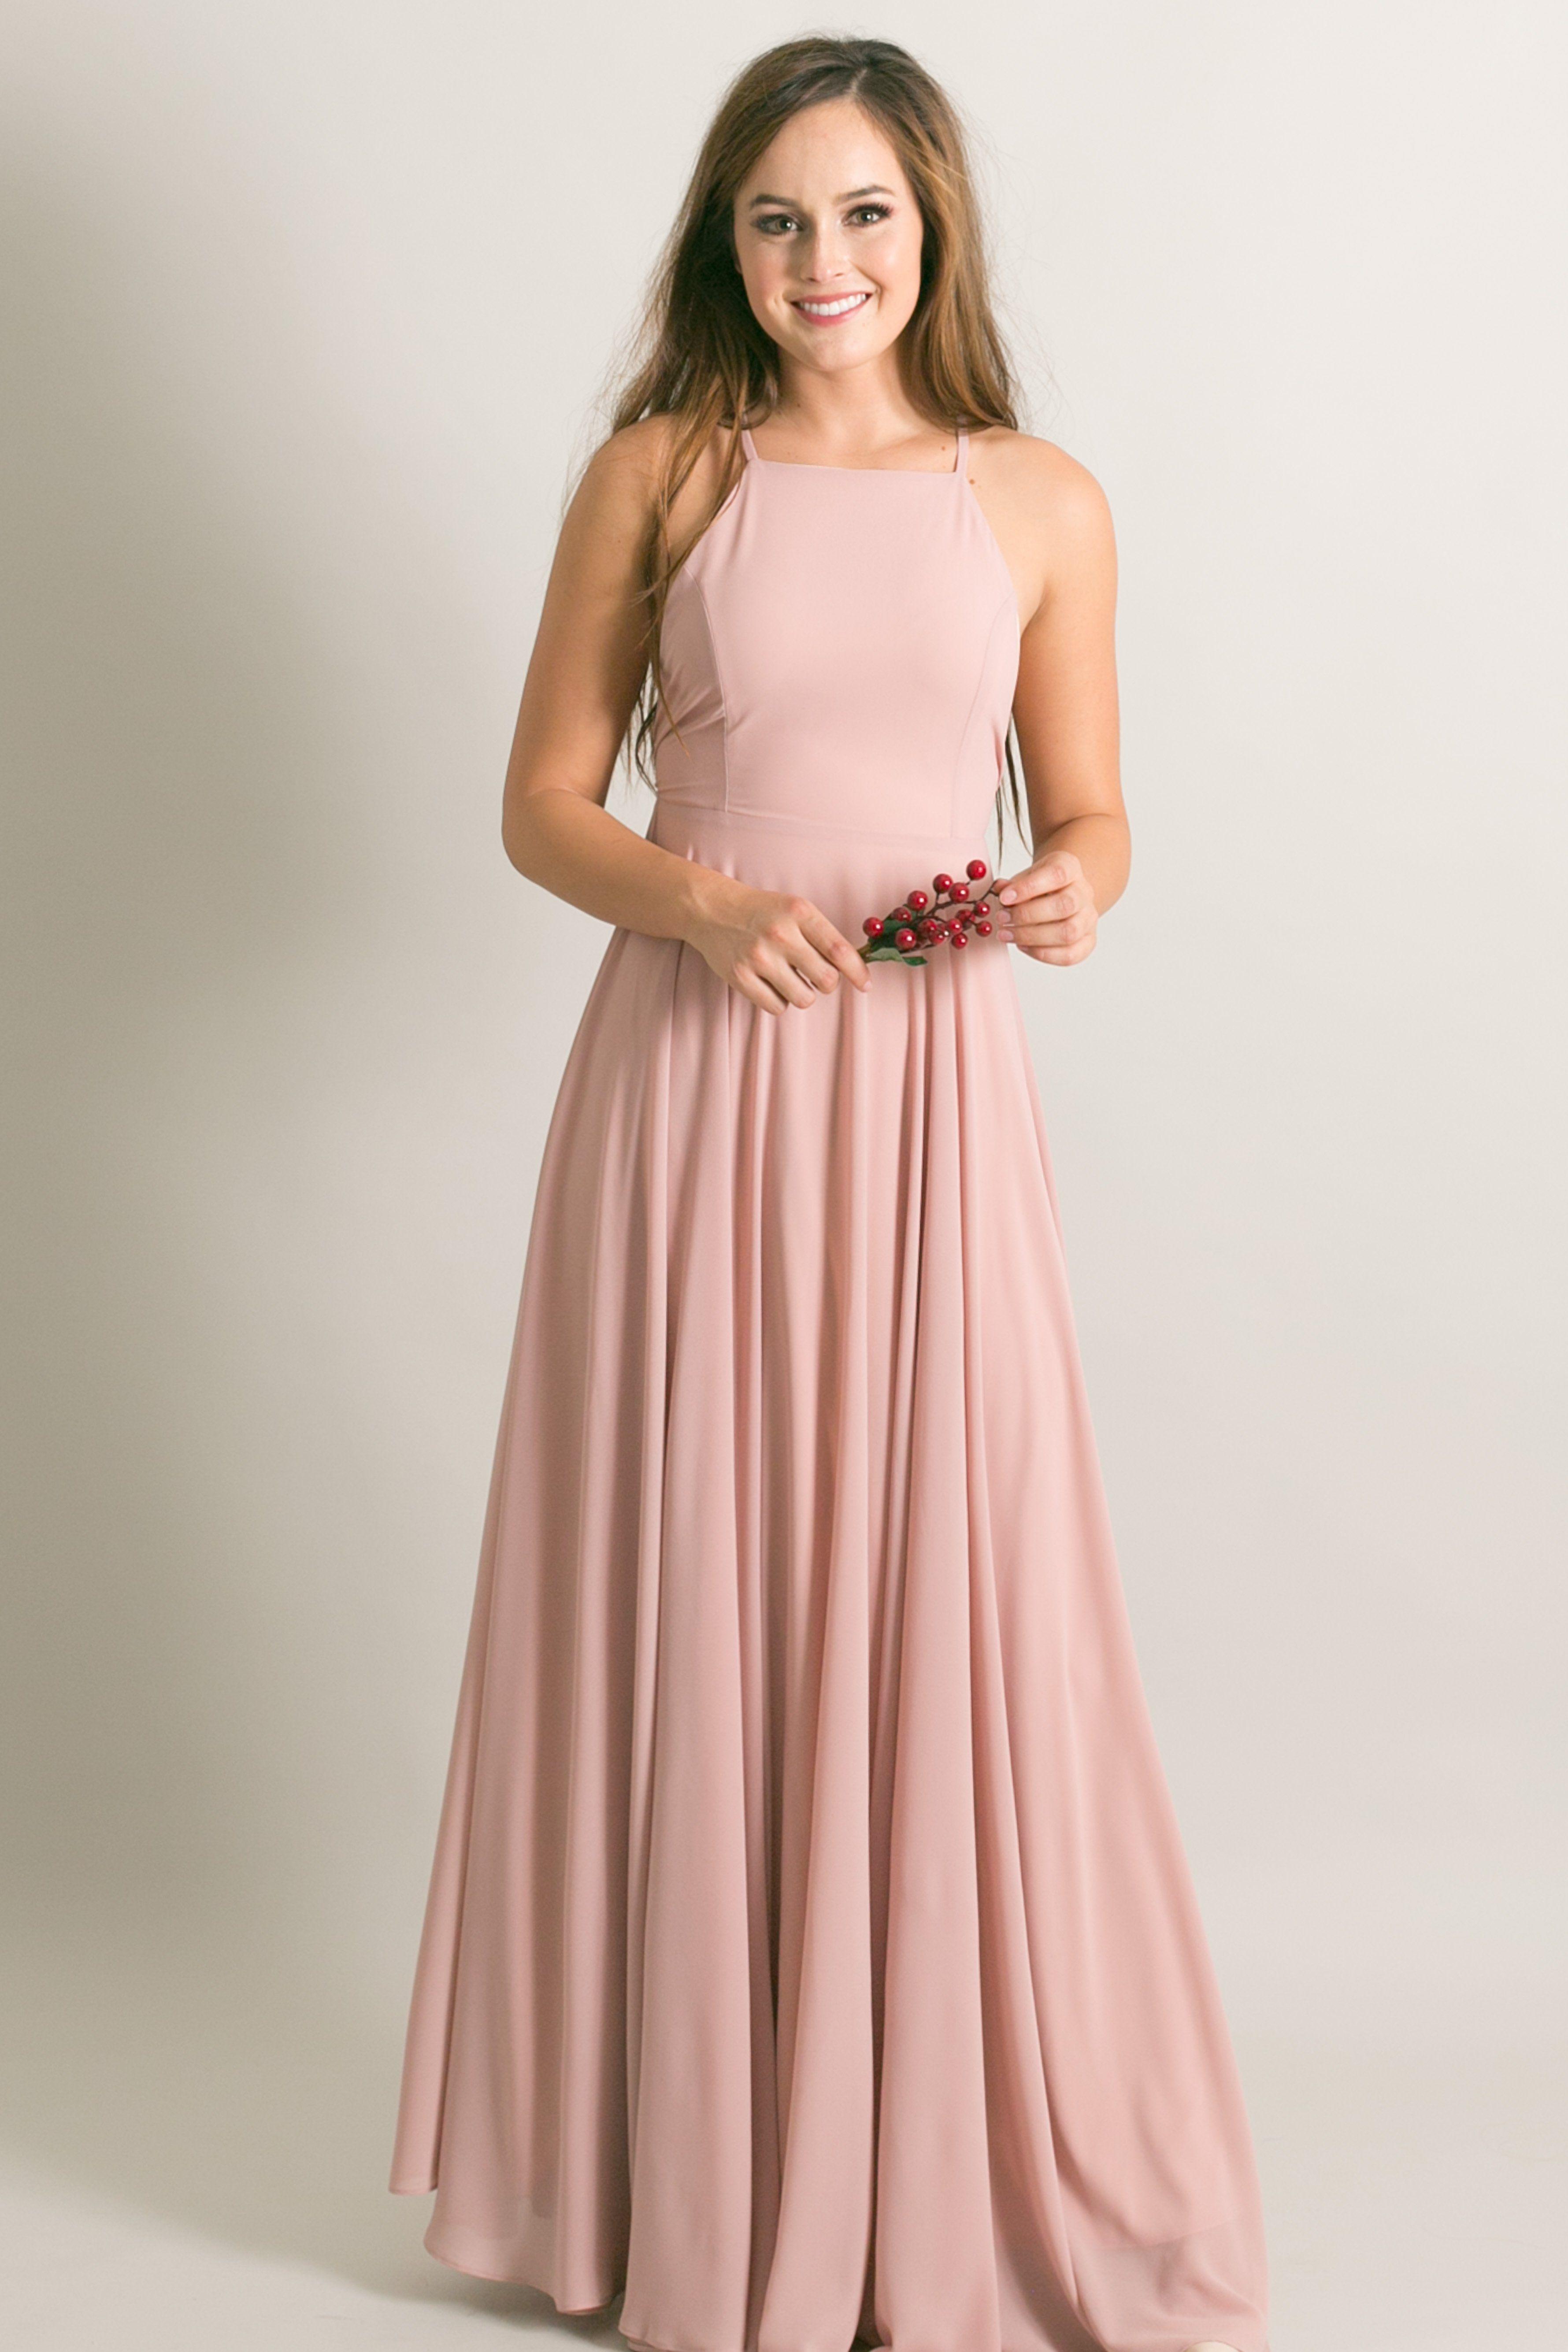 Payton Dusty Millennial Pink Flowy Maxi Dress